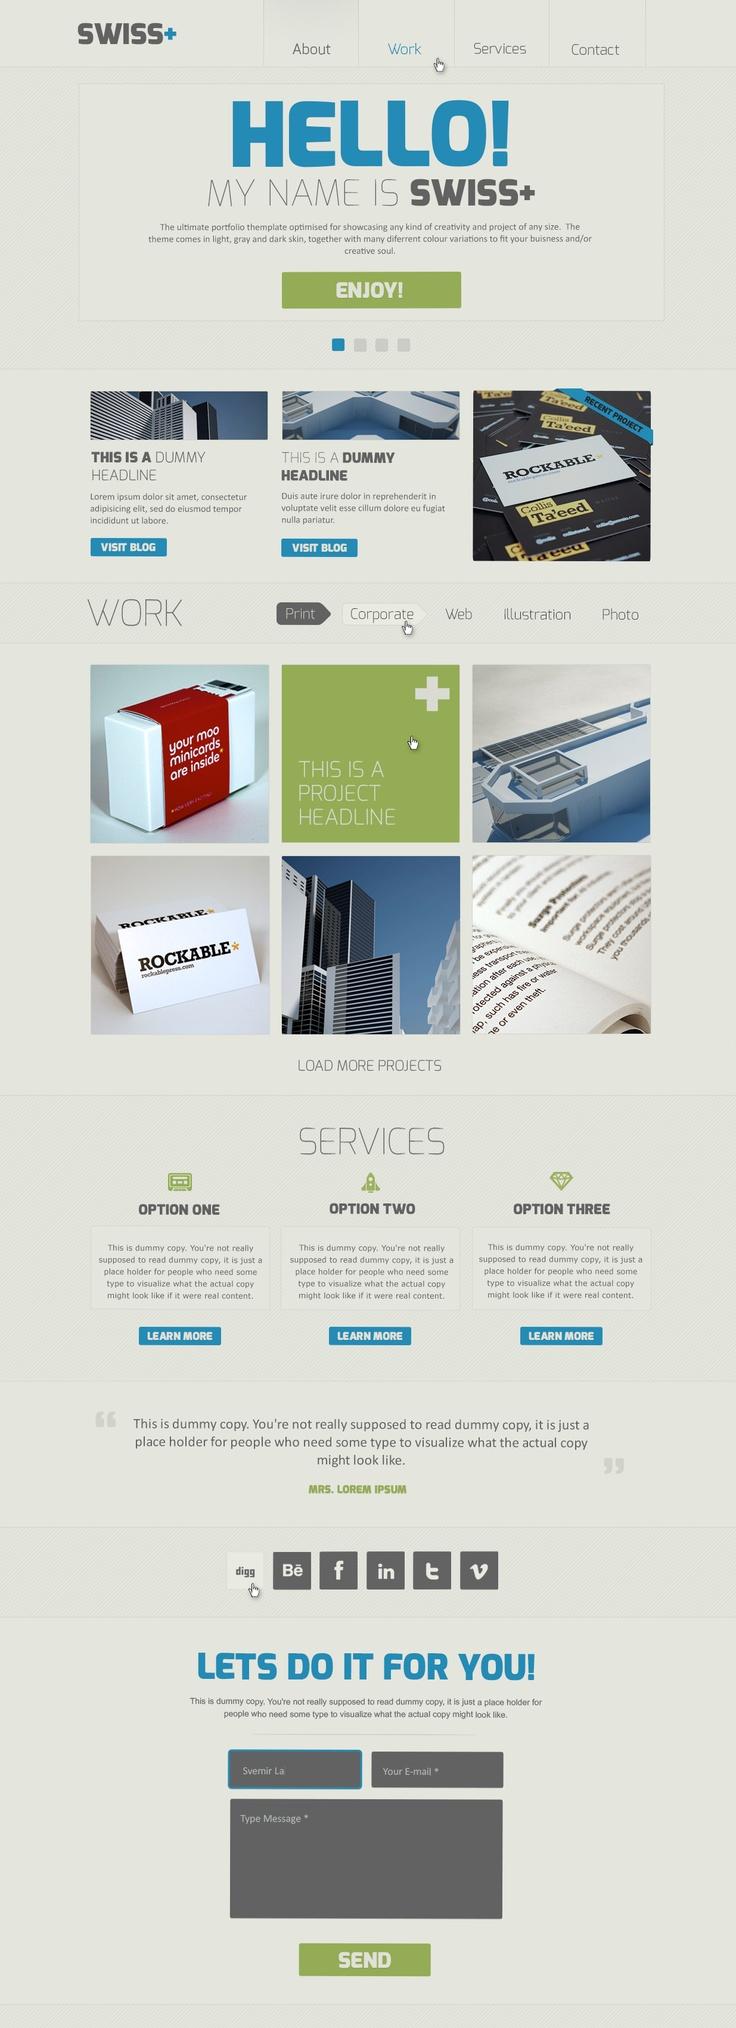 Swiss – Responsive Portfolio PSD Theme  #design #webdesign #template #web #graphic #psd #photoshop #website #responsive #flat #metro #modern #stylish